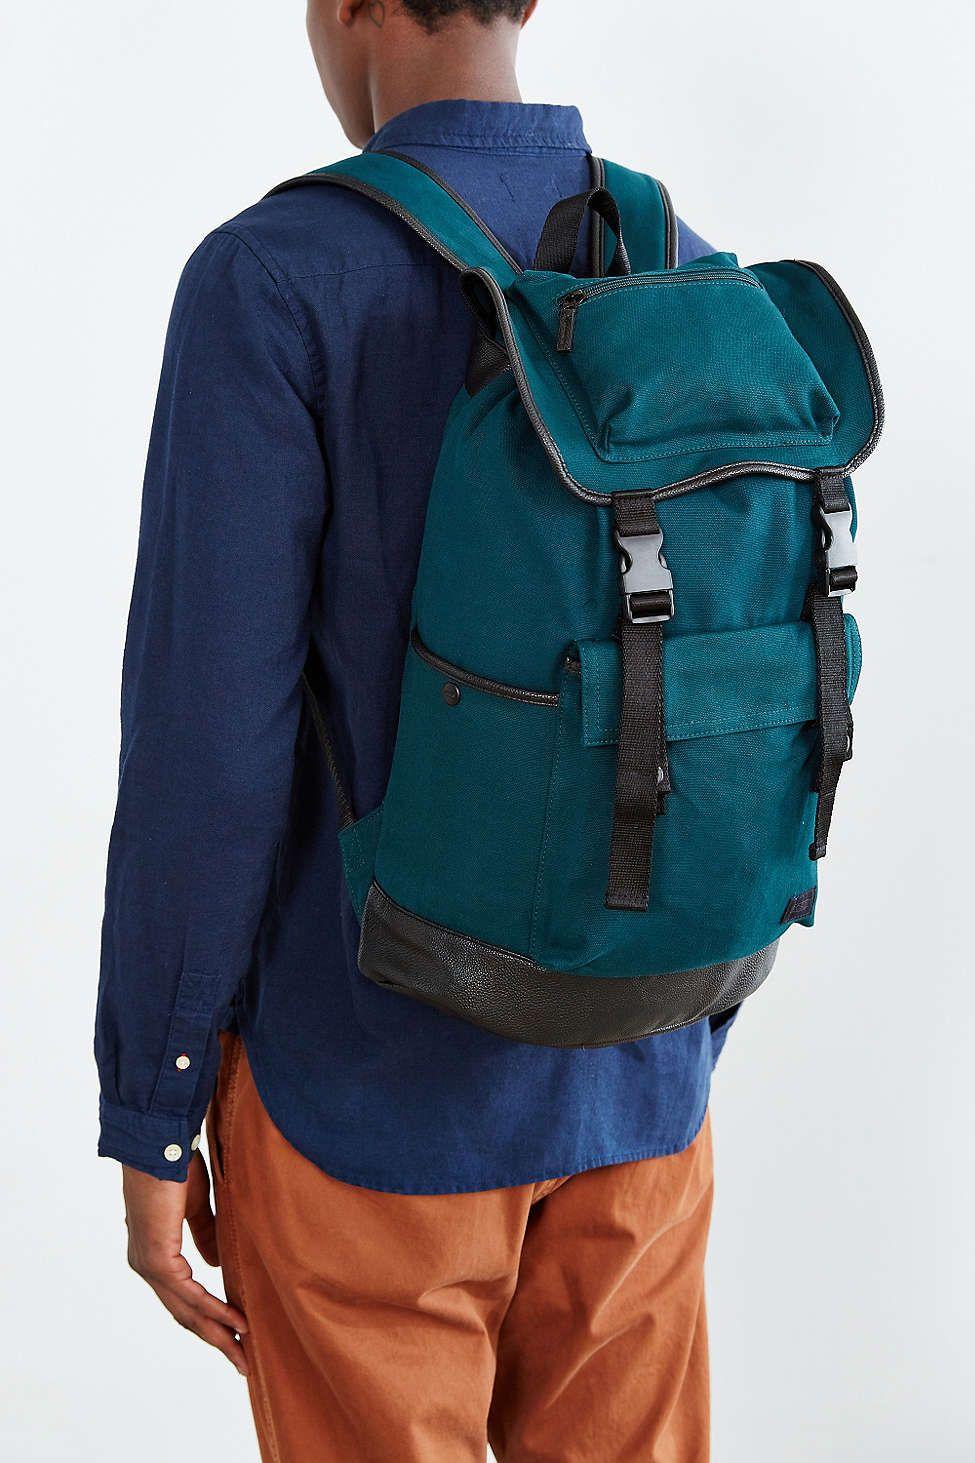 Rosin Rucksack Backpack